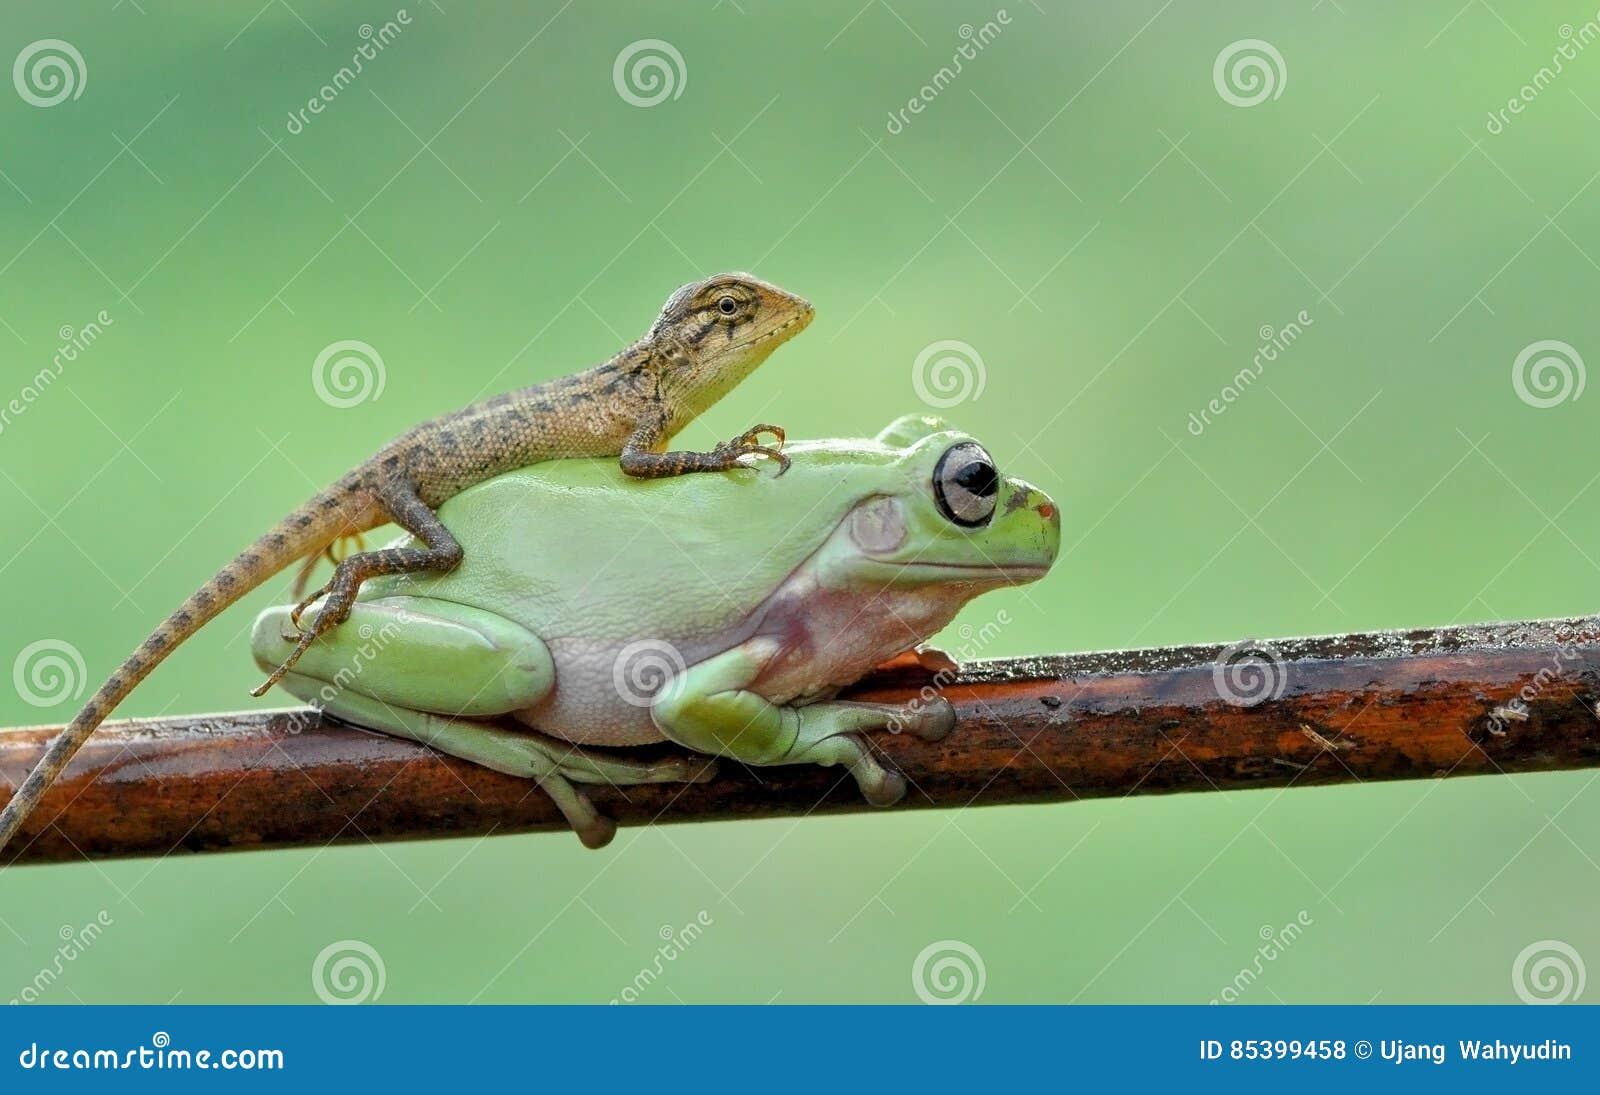 Lizard end frog